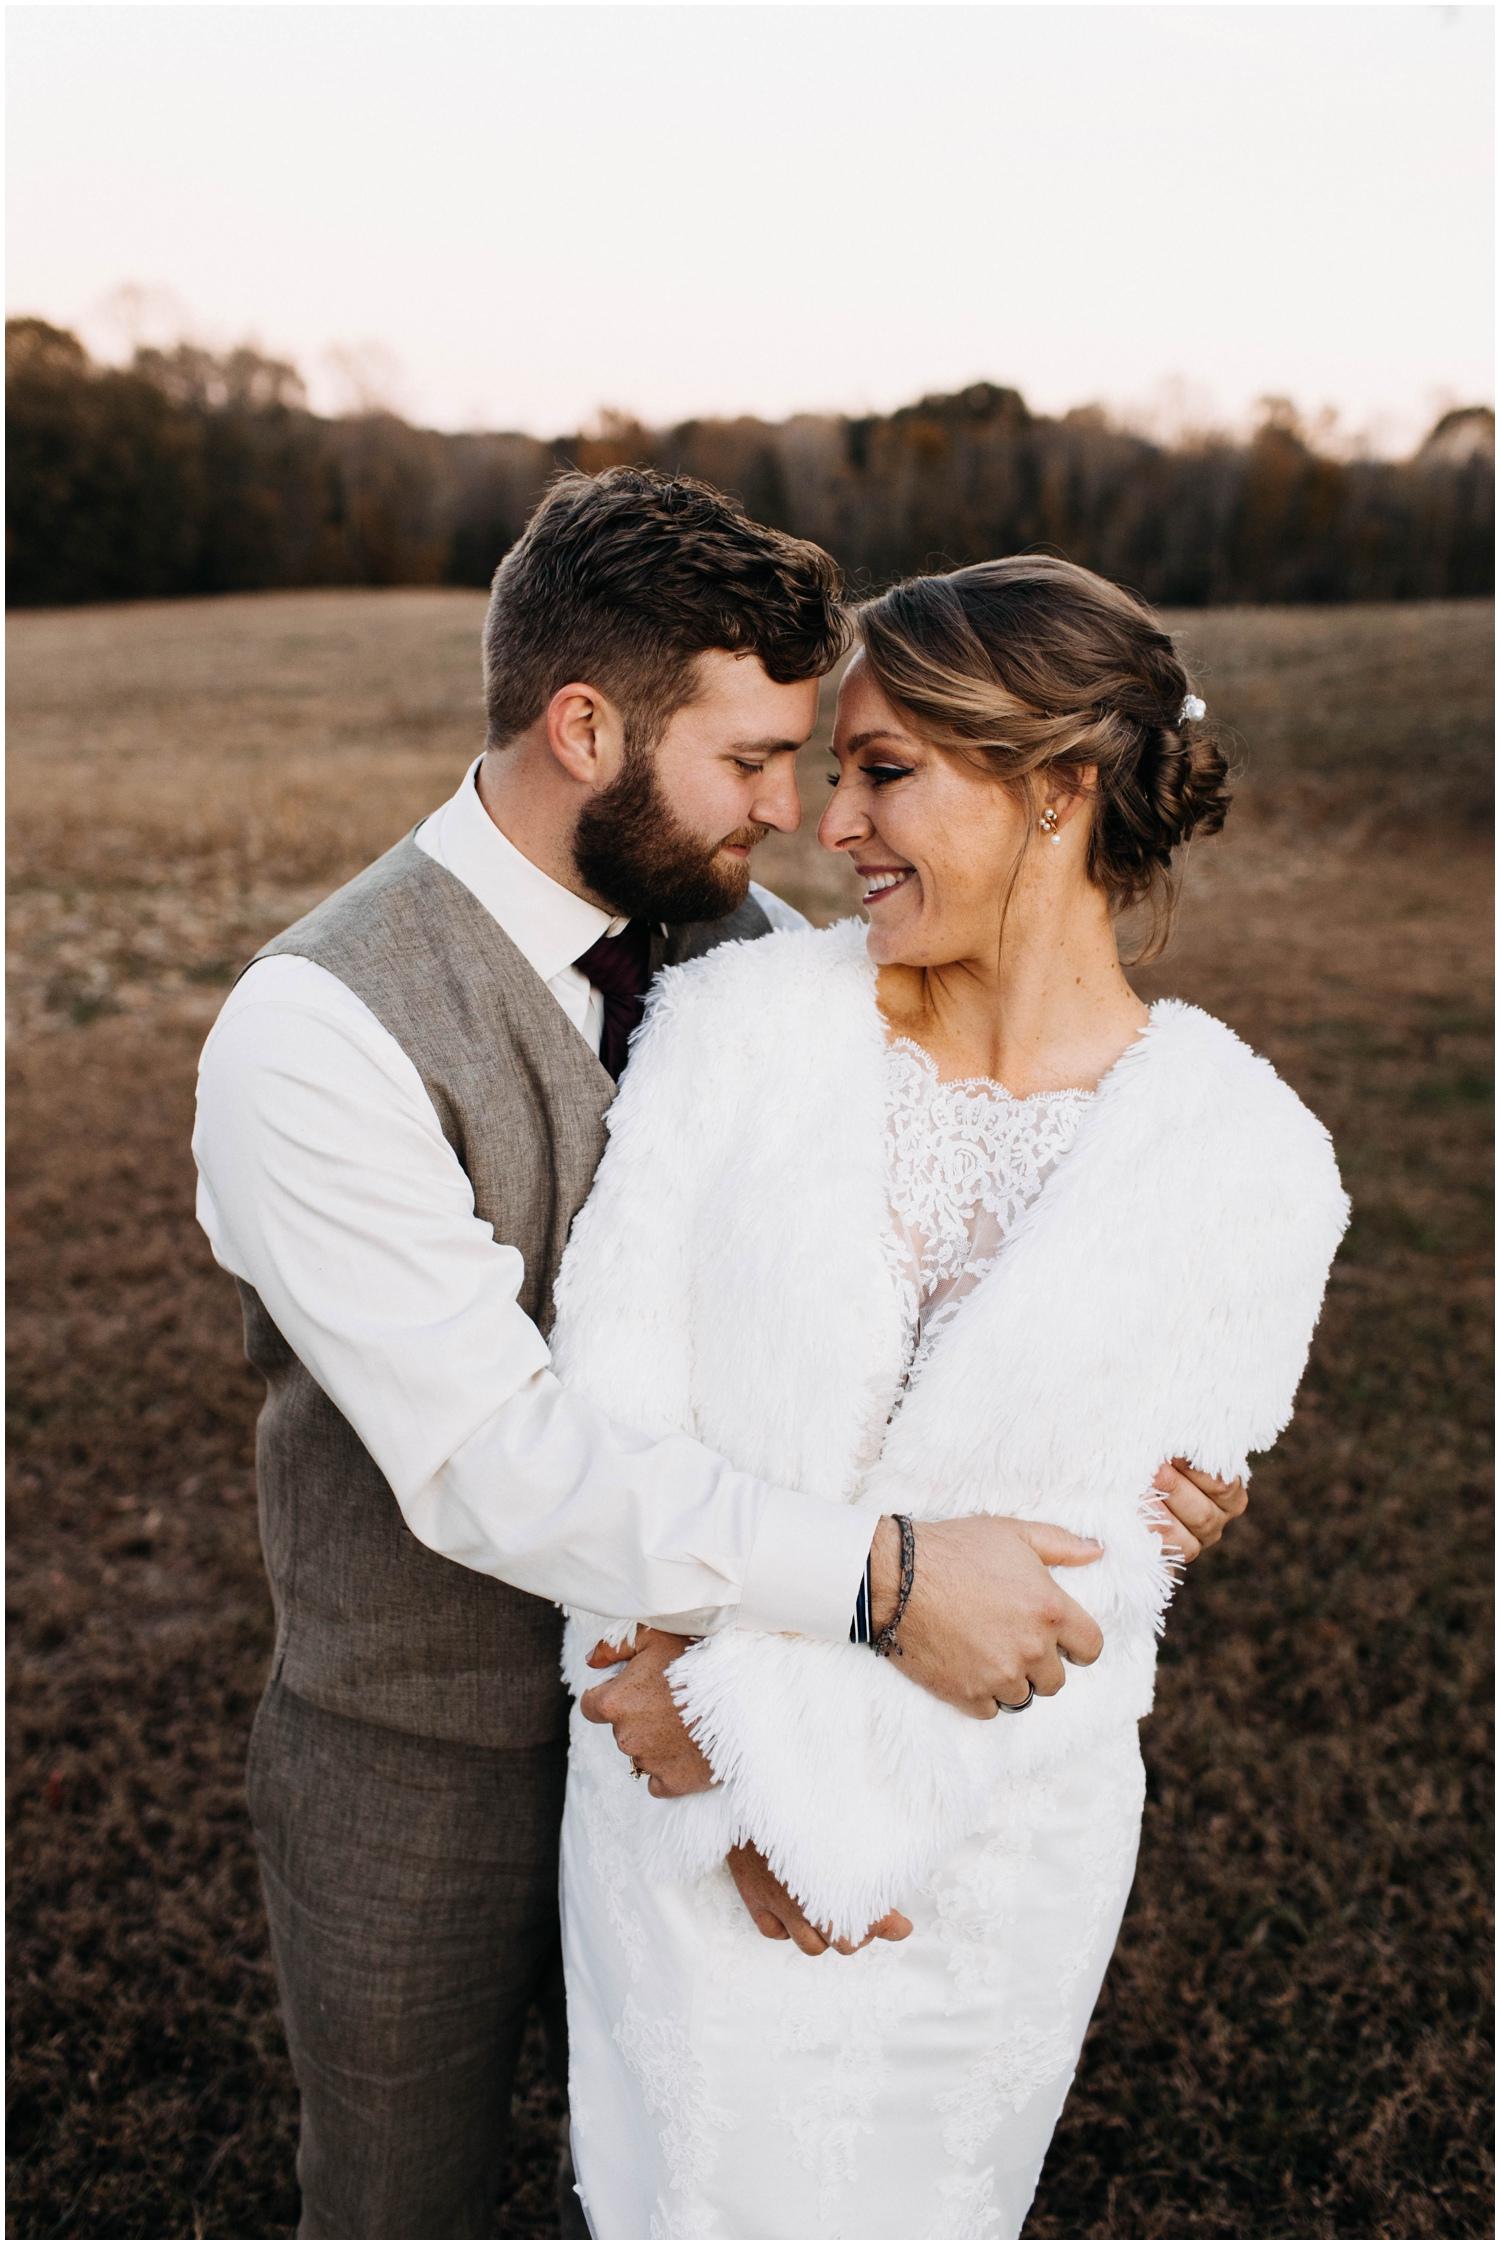 Jess+Dan_rustic_southern_farm_fall_wedding_charlotte_north carolina_taylor powers_0243.jpg